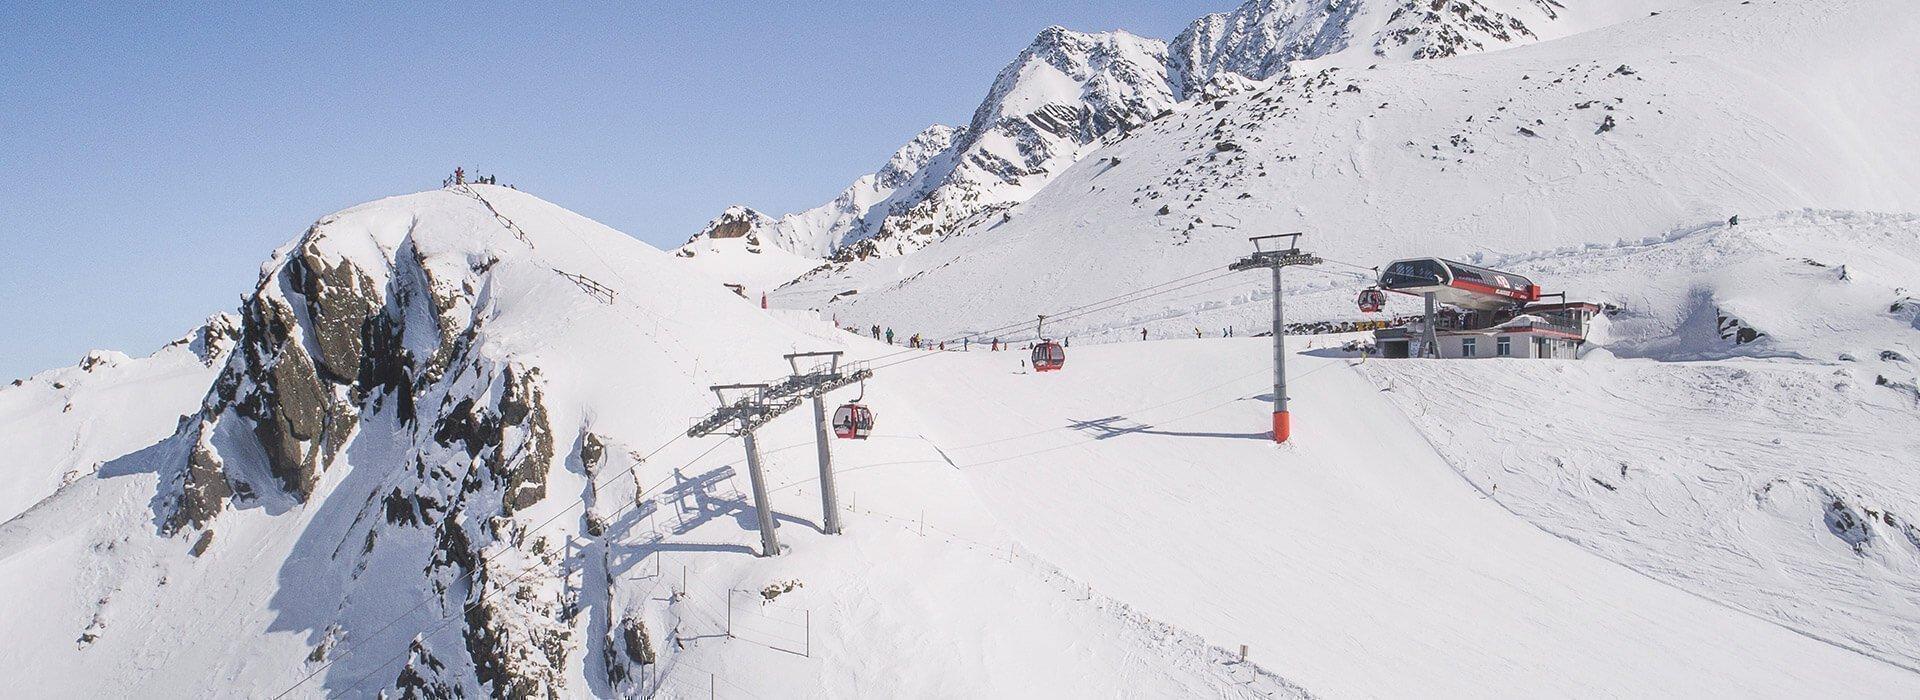 Souty Tyrol ski areas - Klausberg